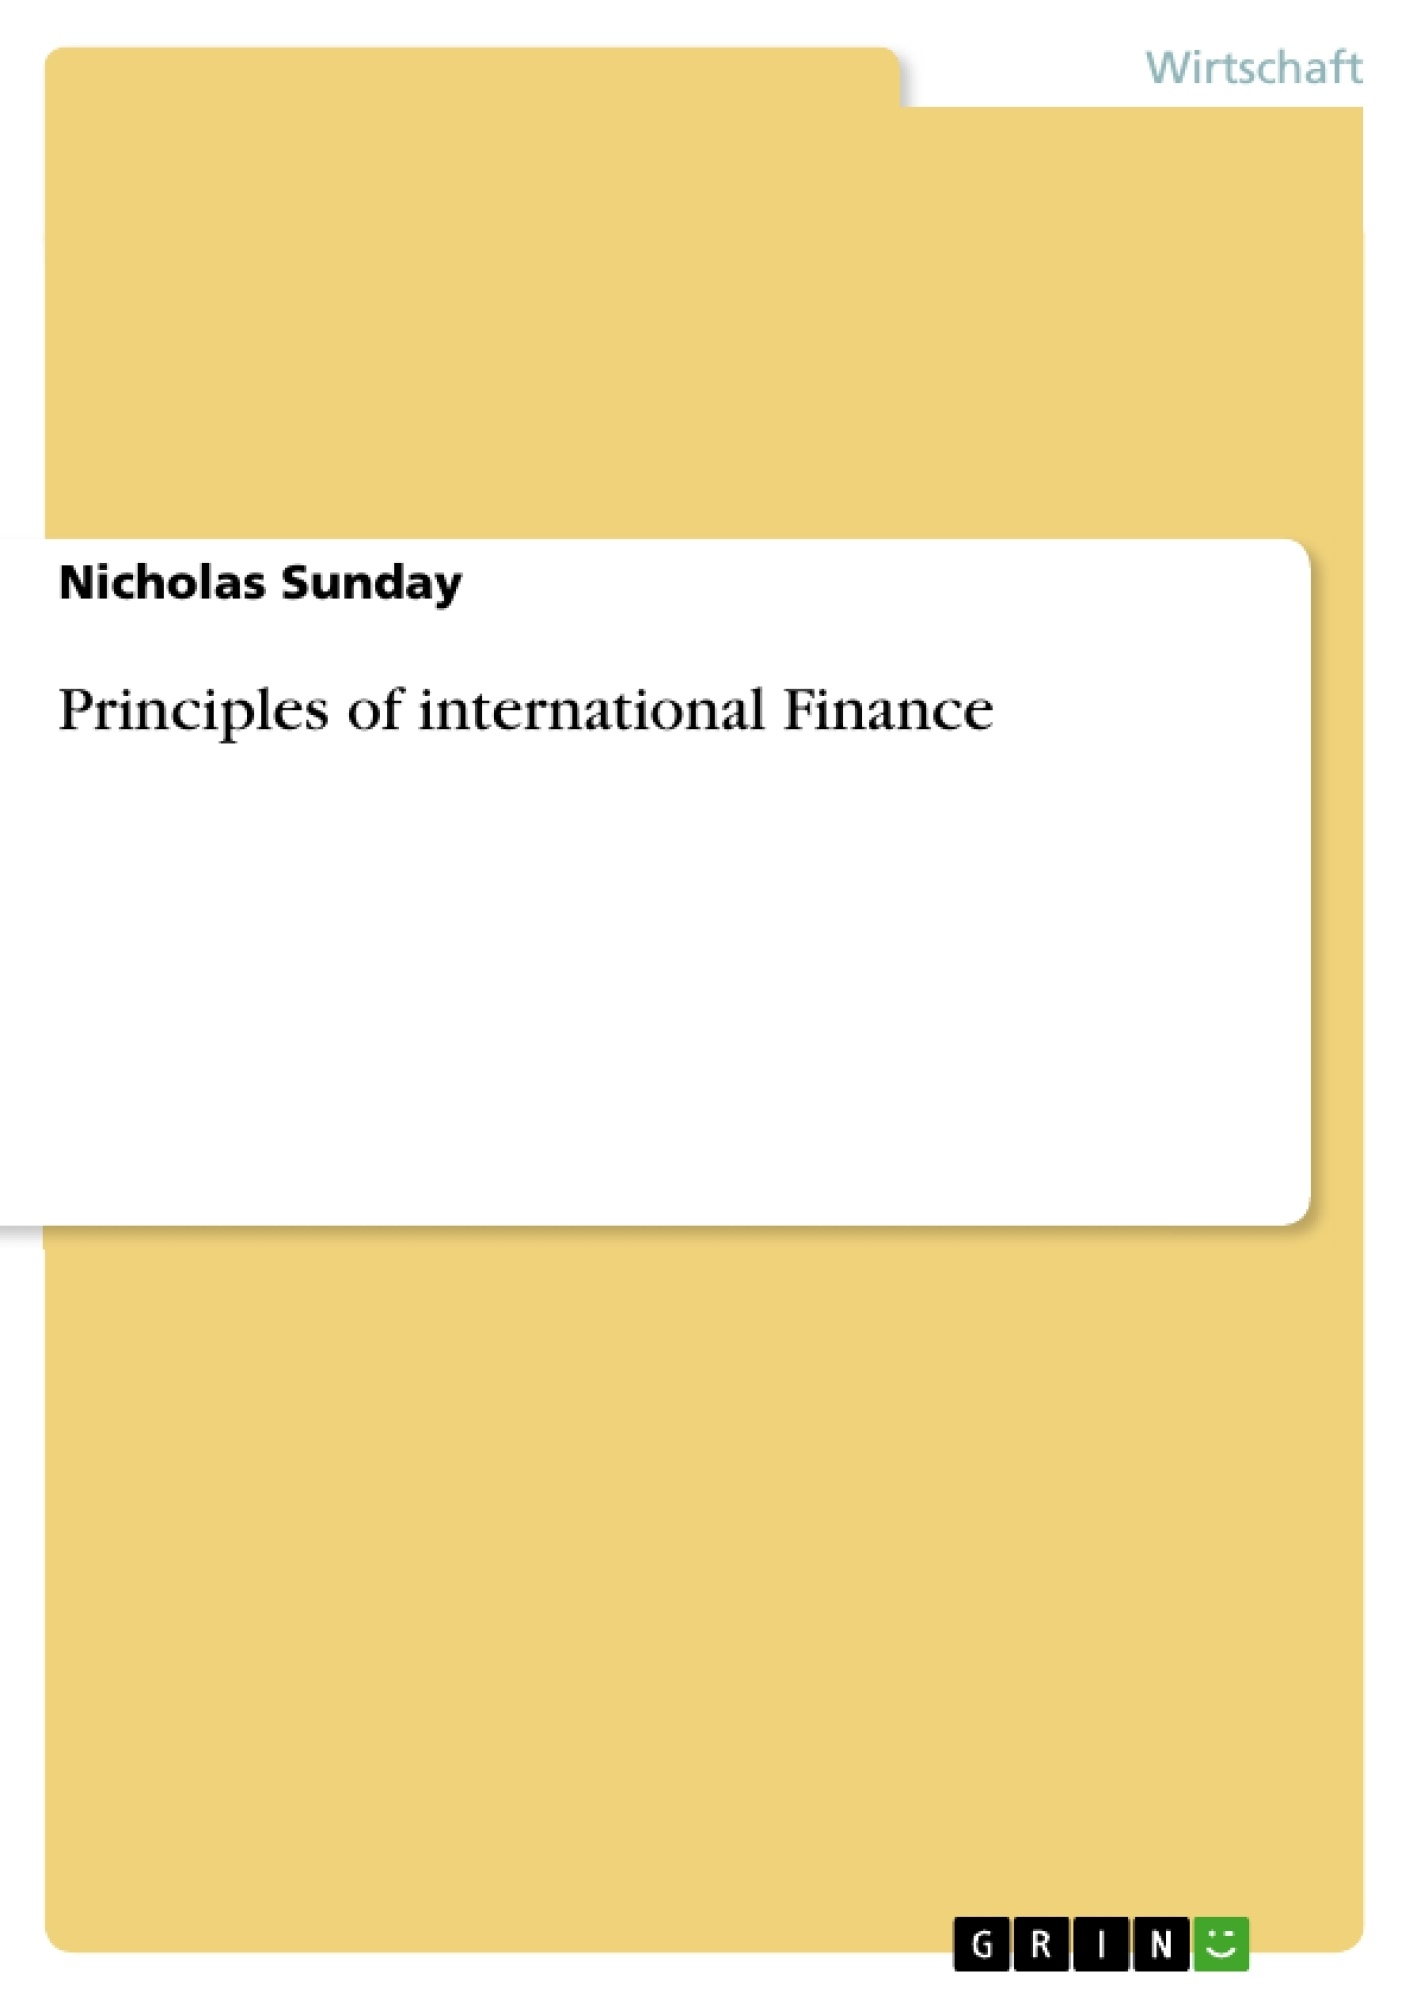 Titel: Principles of international Finance